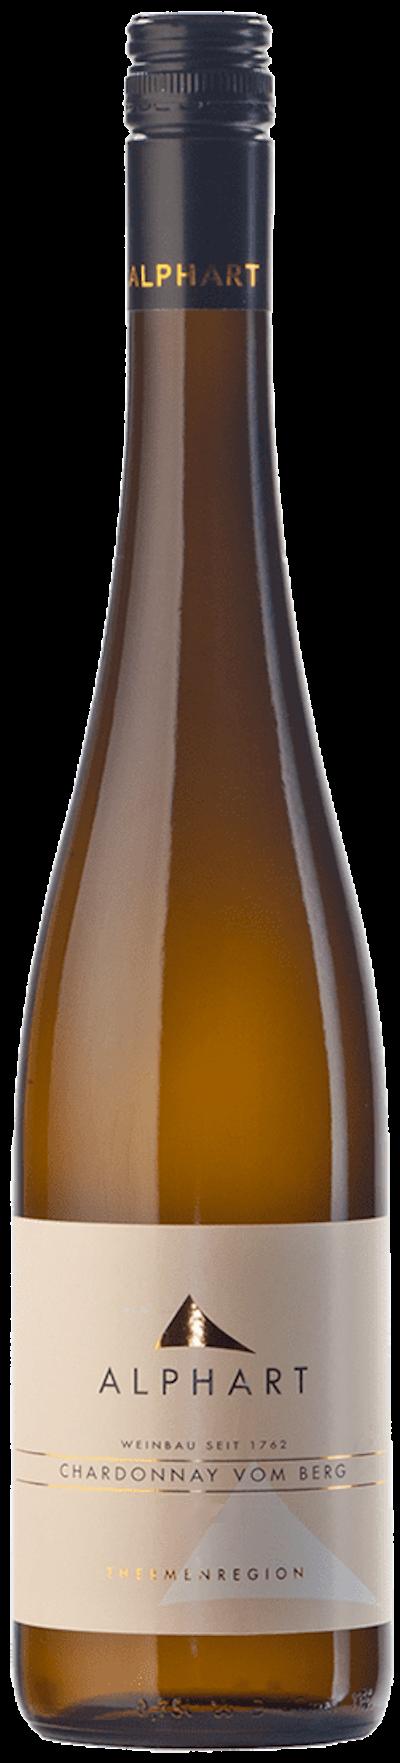 Alphart - Chardonnay vom Berg